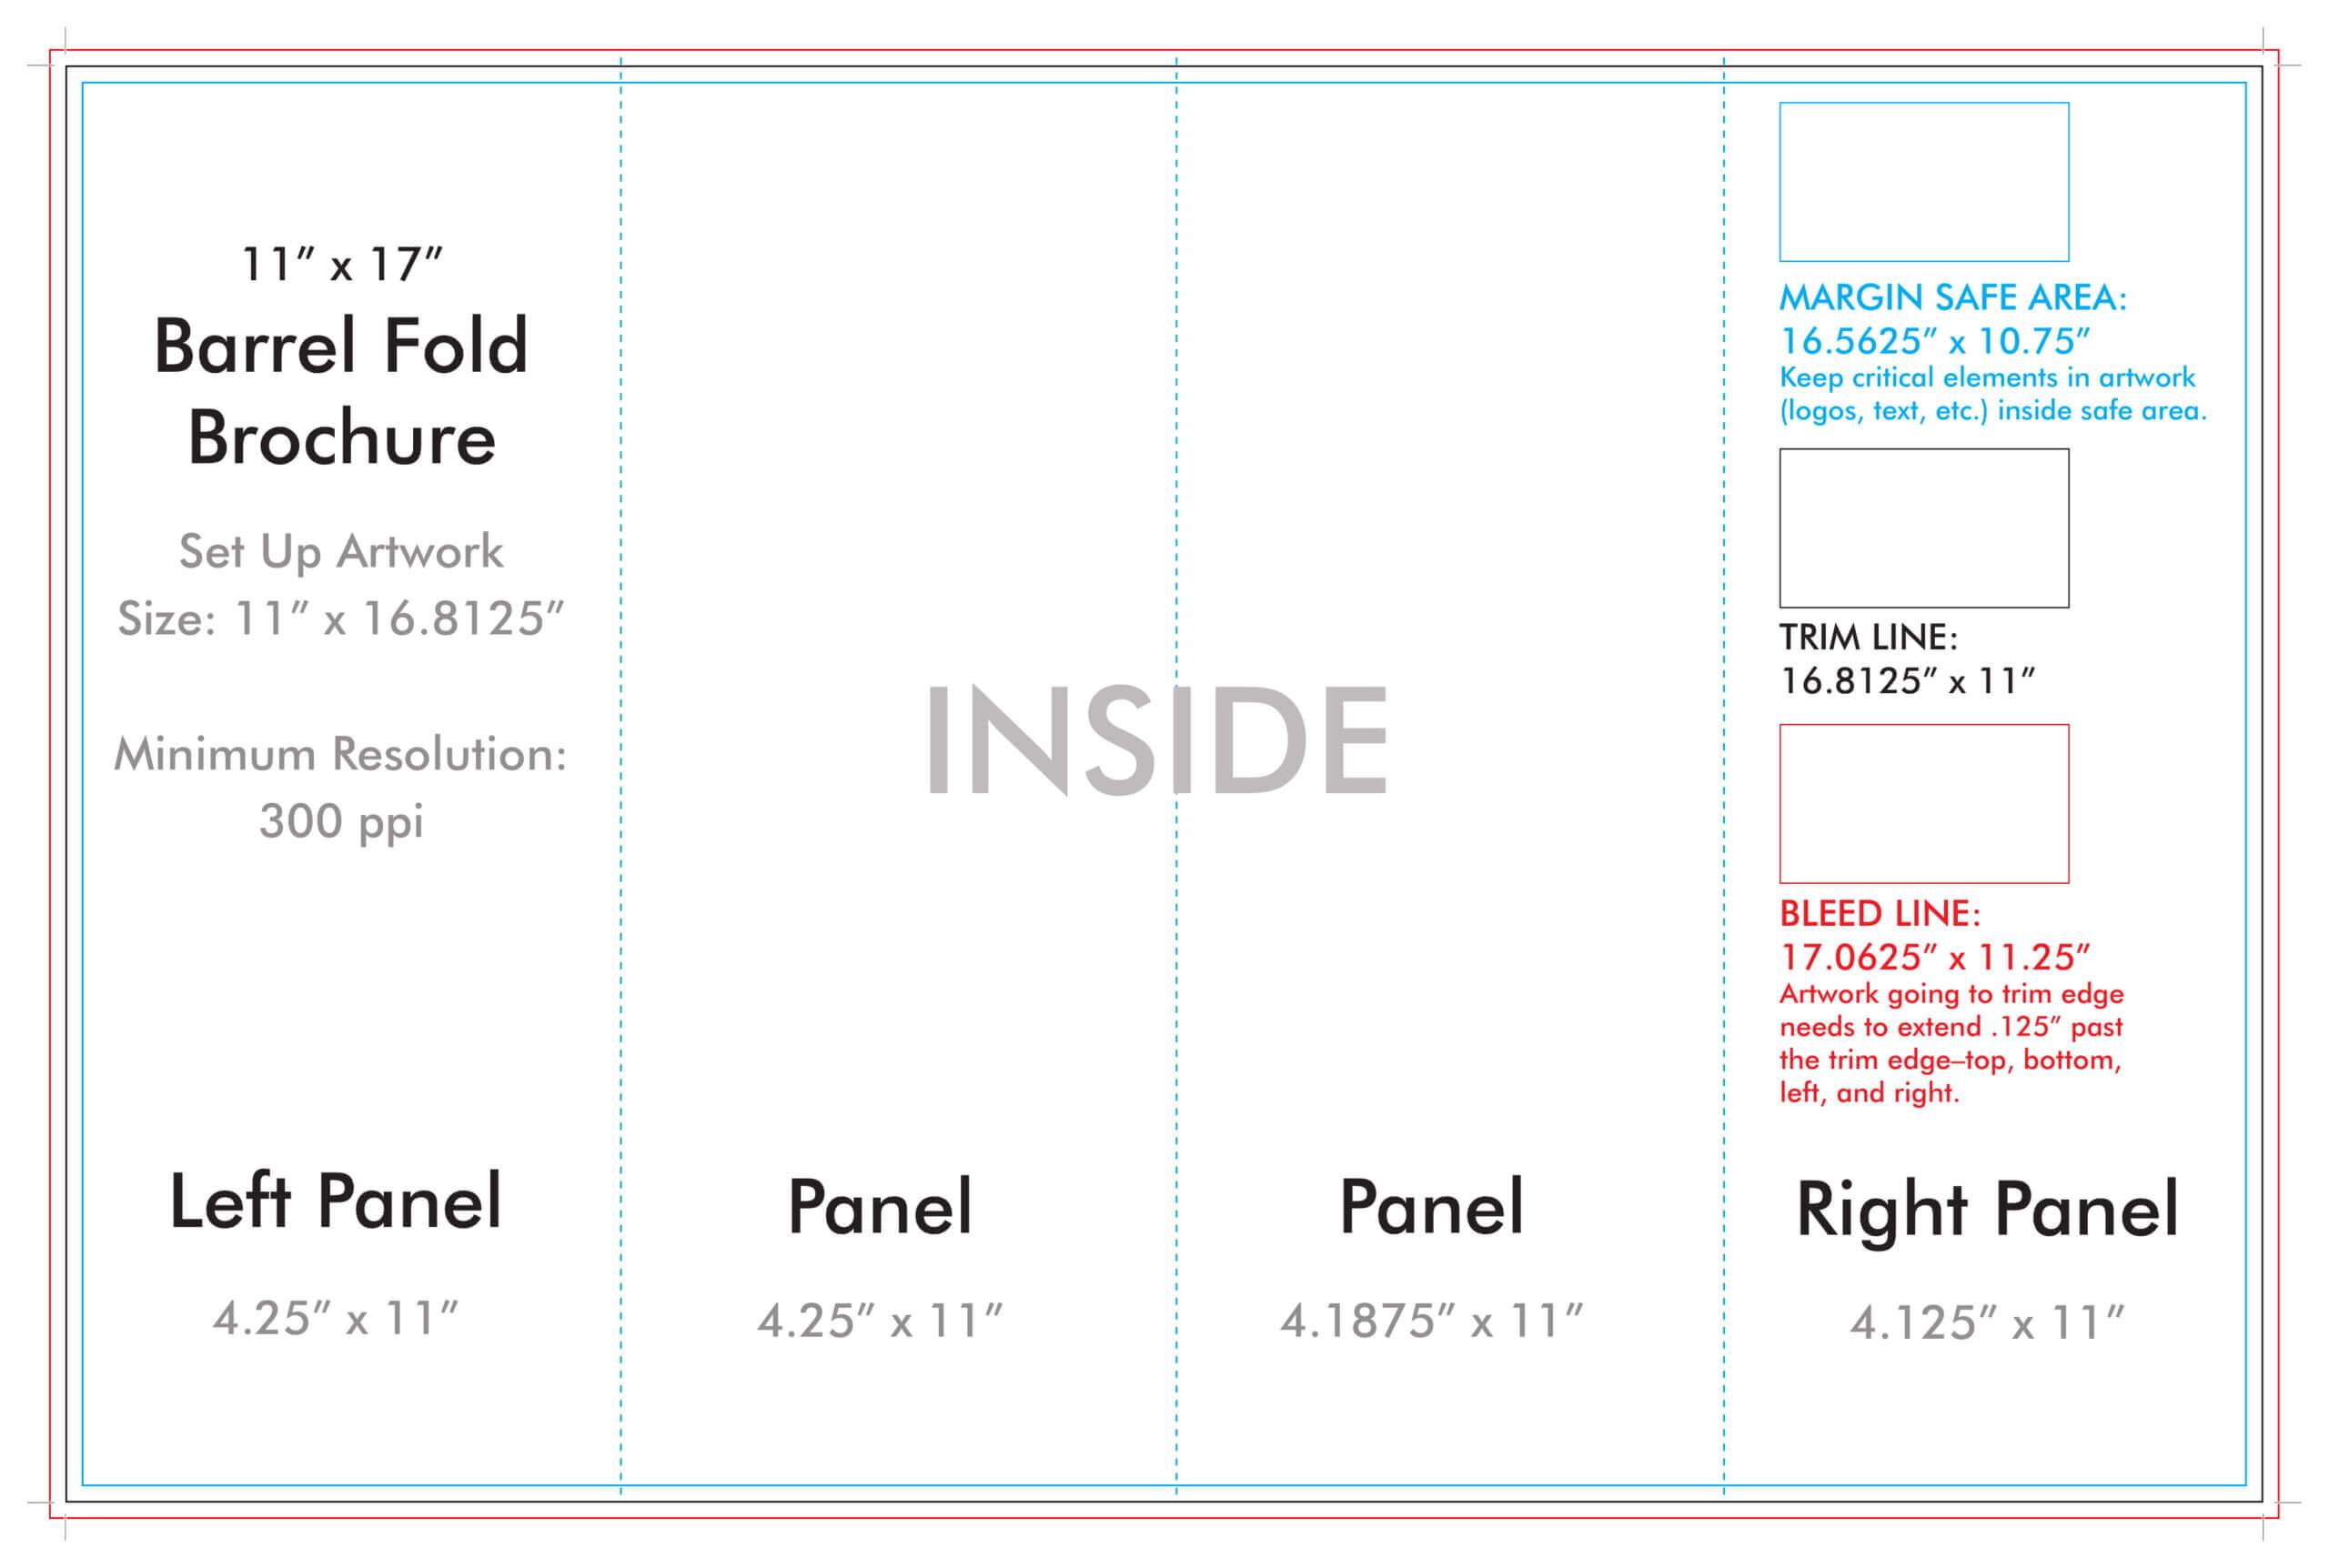 4 Fold Brochure Template - Calep.midnightpig.co Throughout 4 Fold Brochure Template